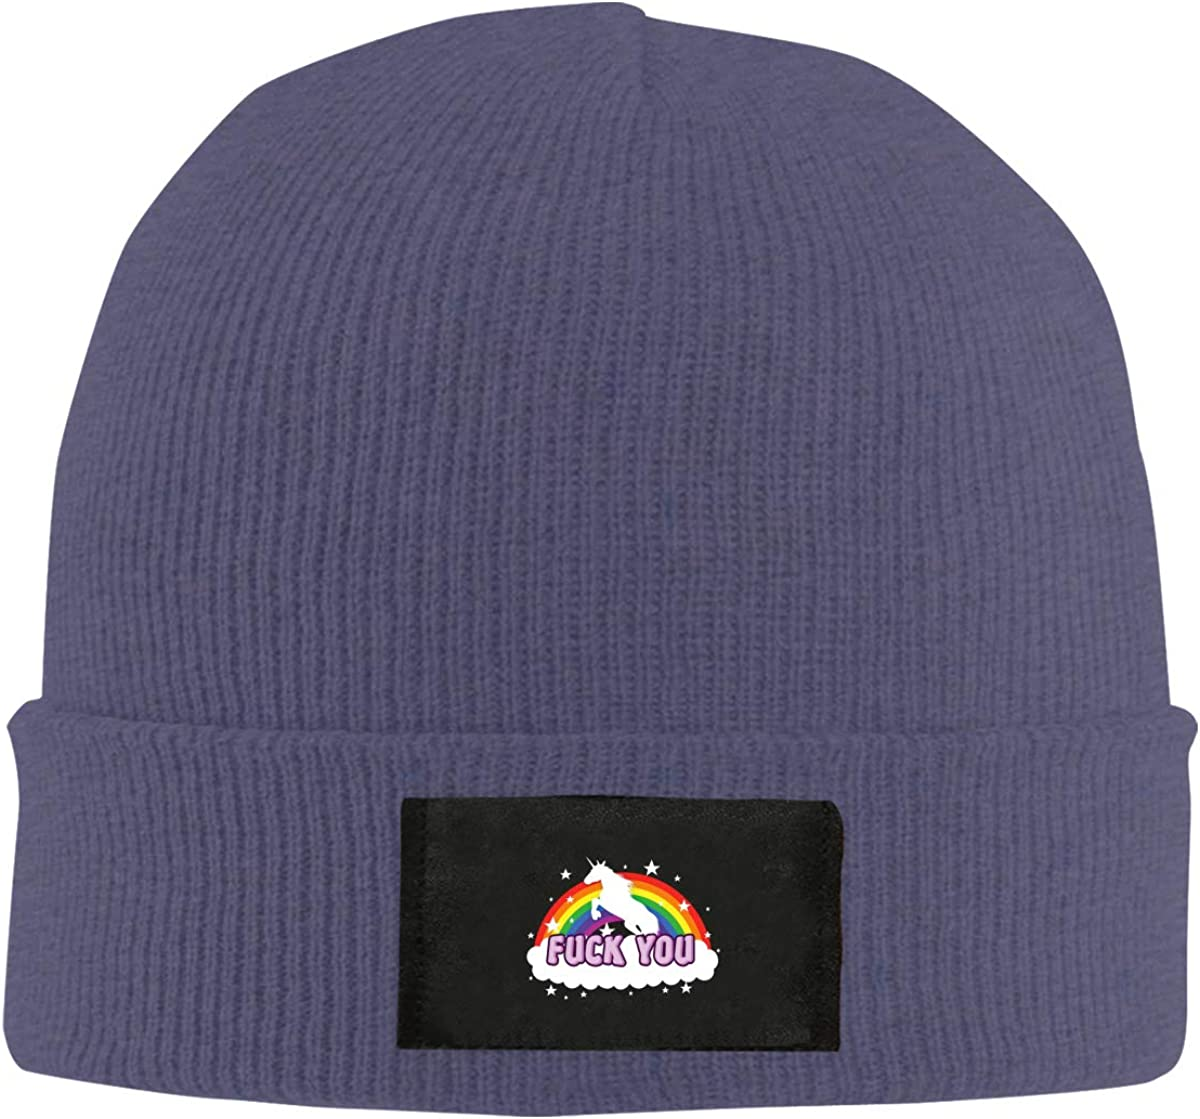 Fuck You Rainbow Top Level Beanie Men Women Unisex Stylish Slouch Beanie Hats Black